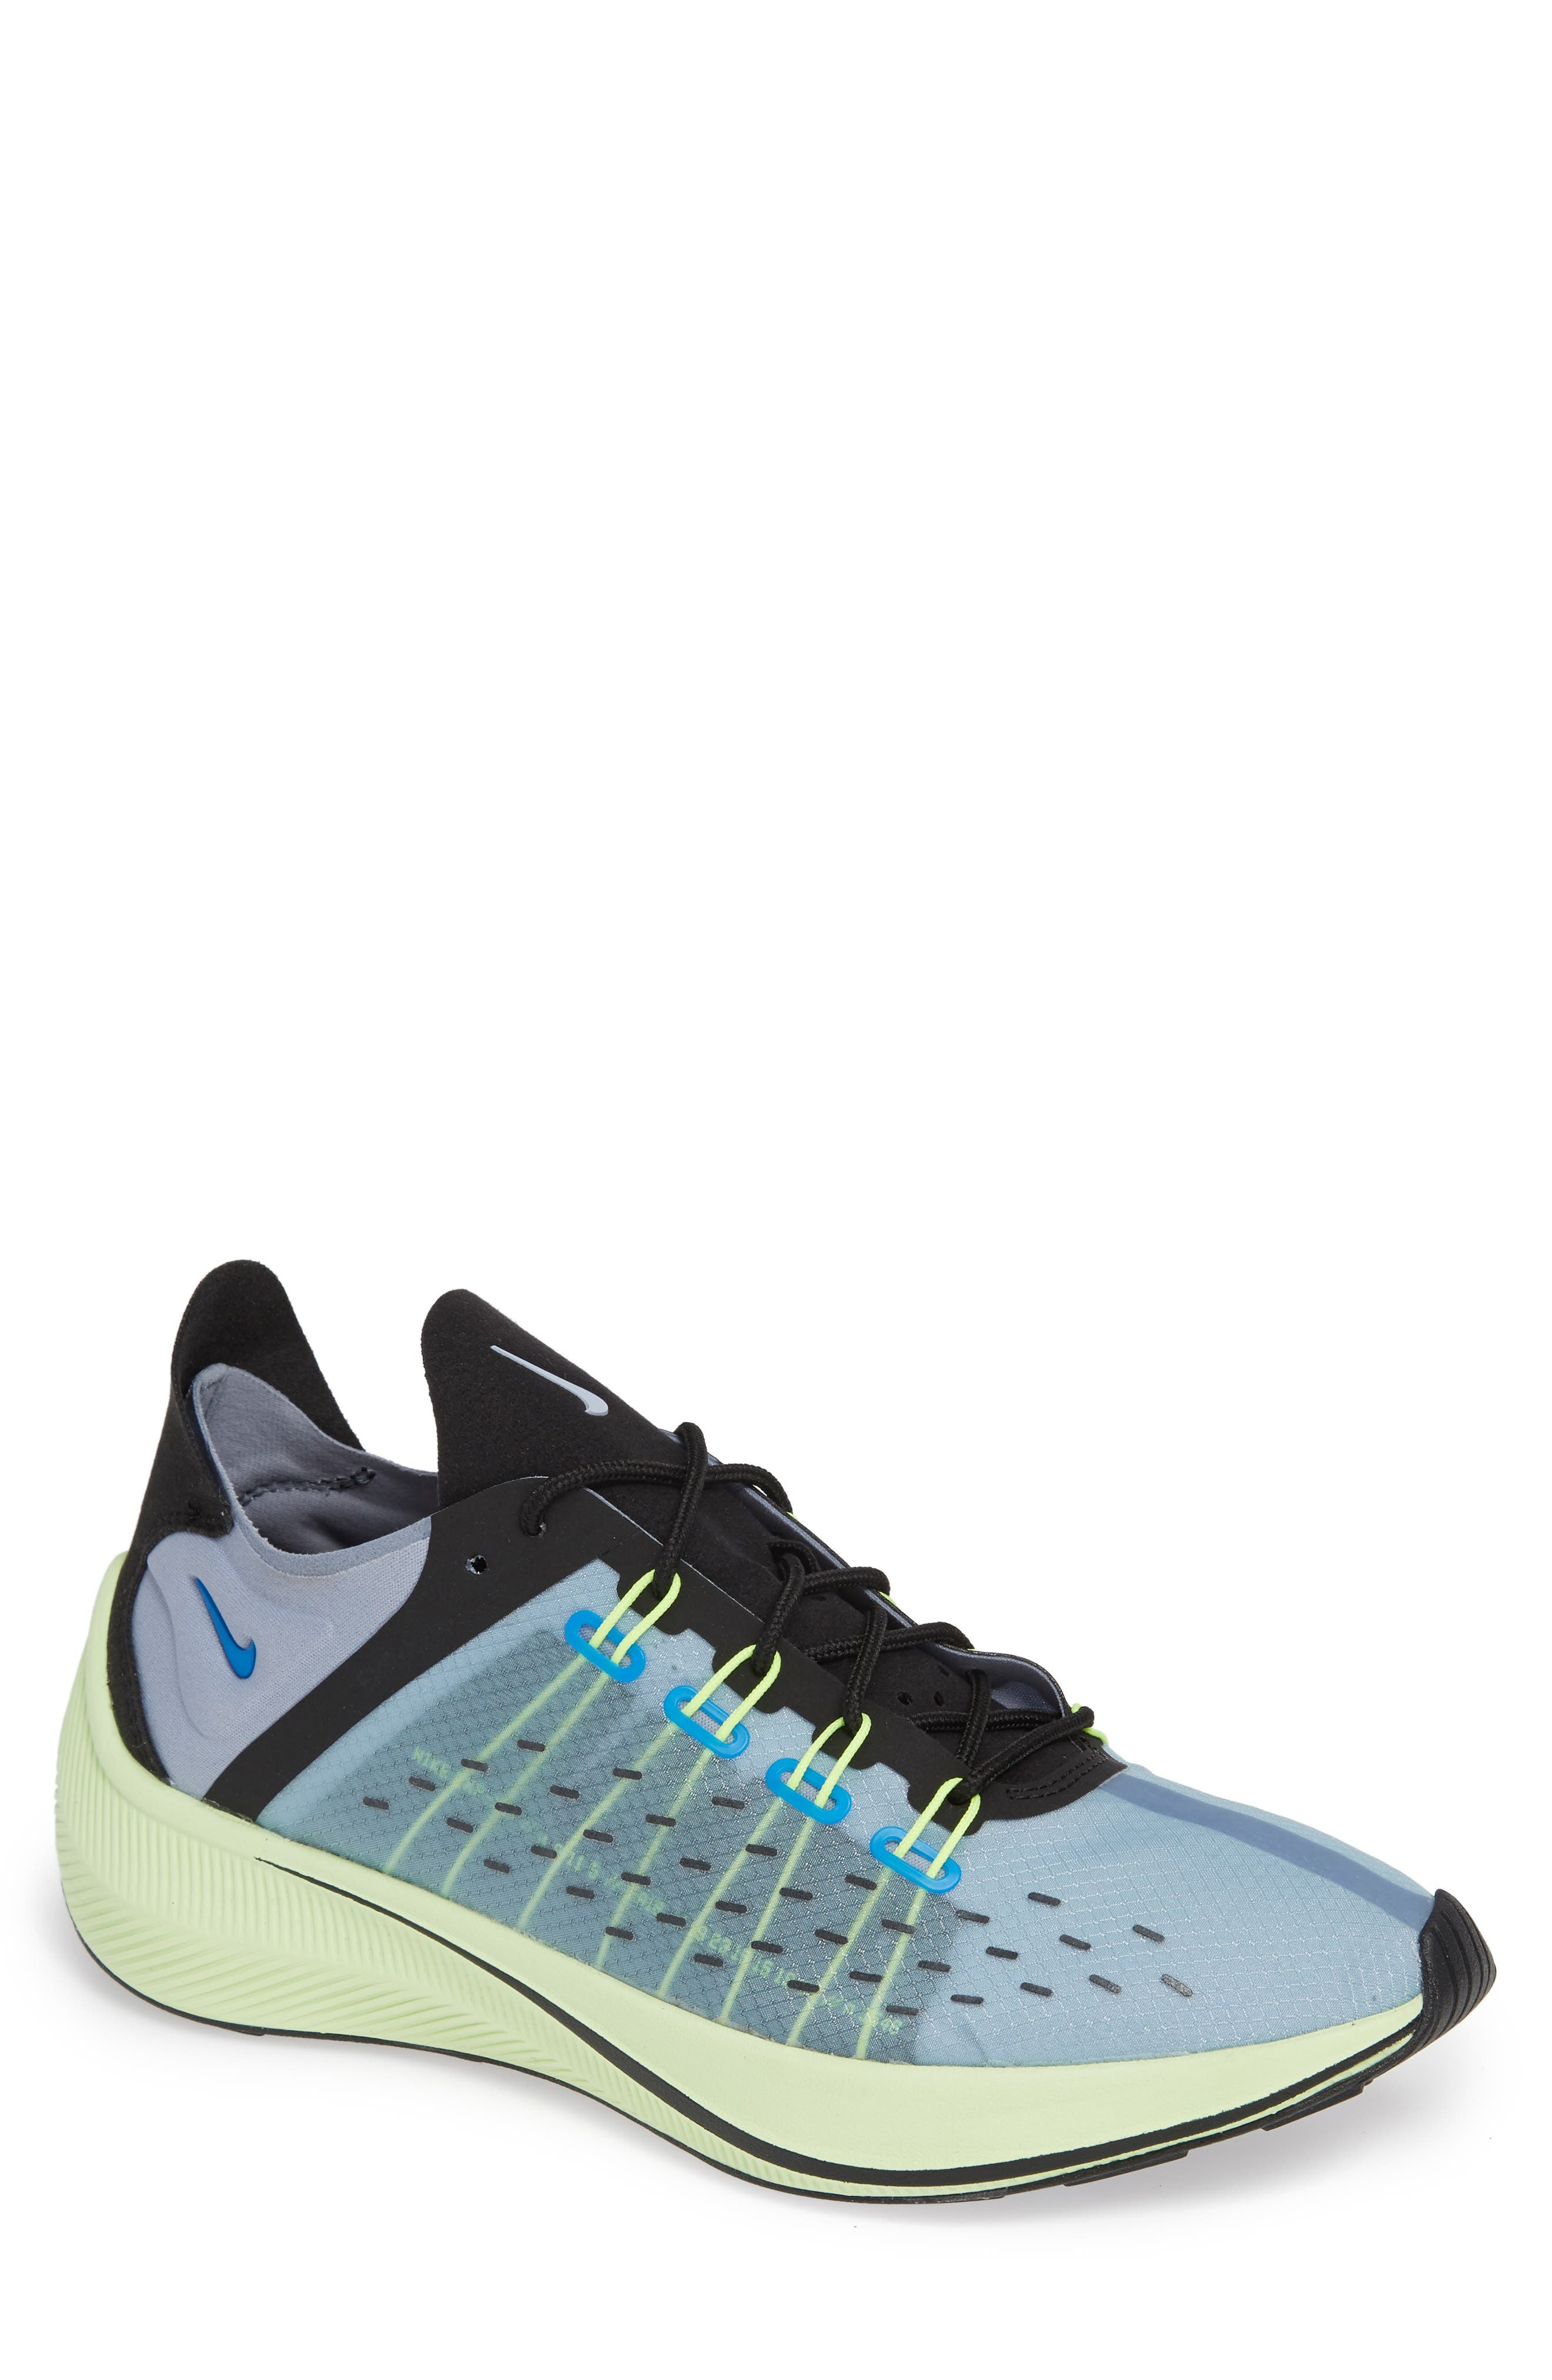 EXP-X14 Running Shoe,                             Main thumbnail 1, color,                             PHOTO BLUE/ GLACIER GREY